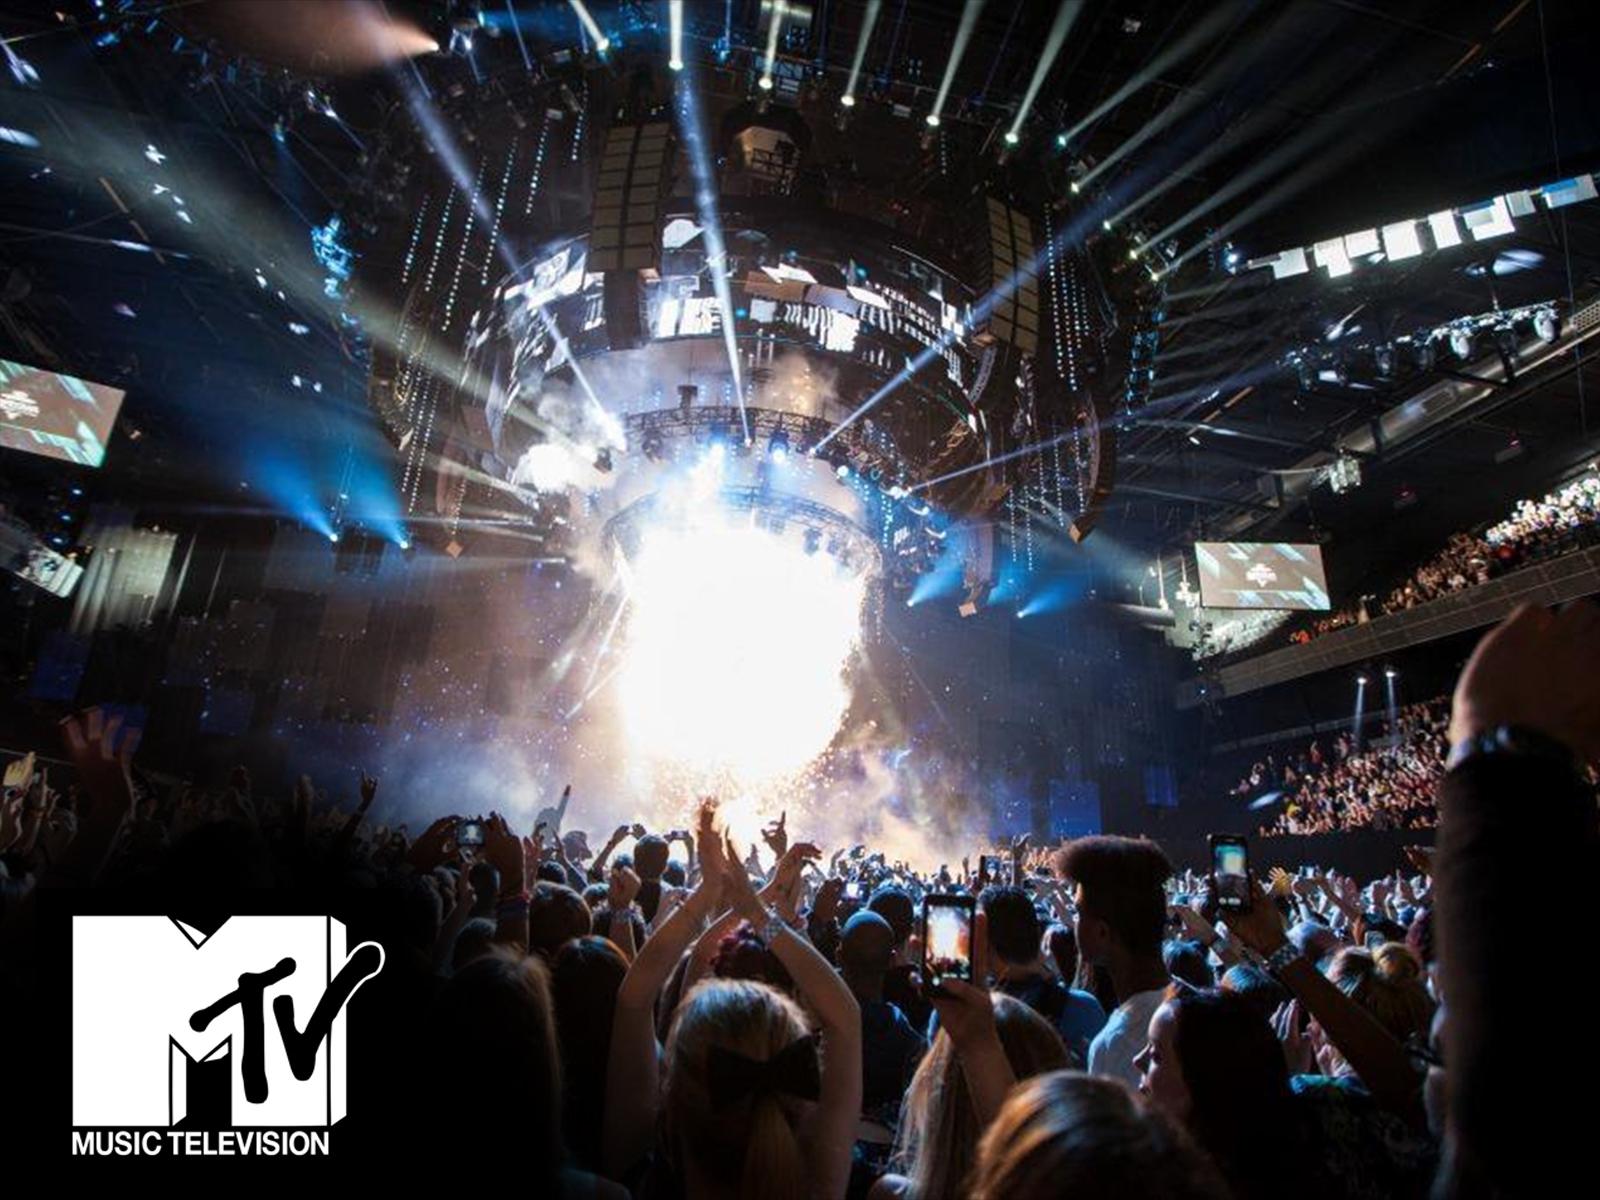 MTVtelevision